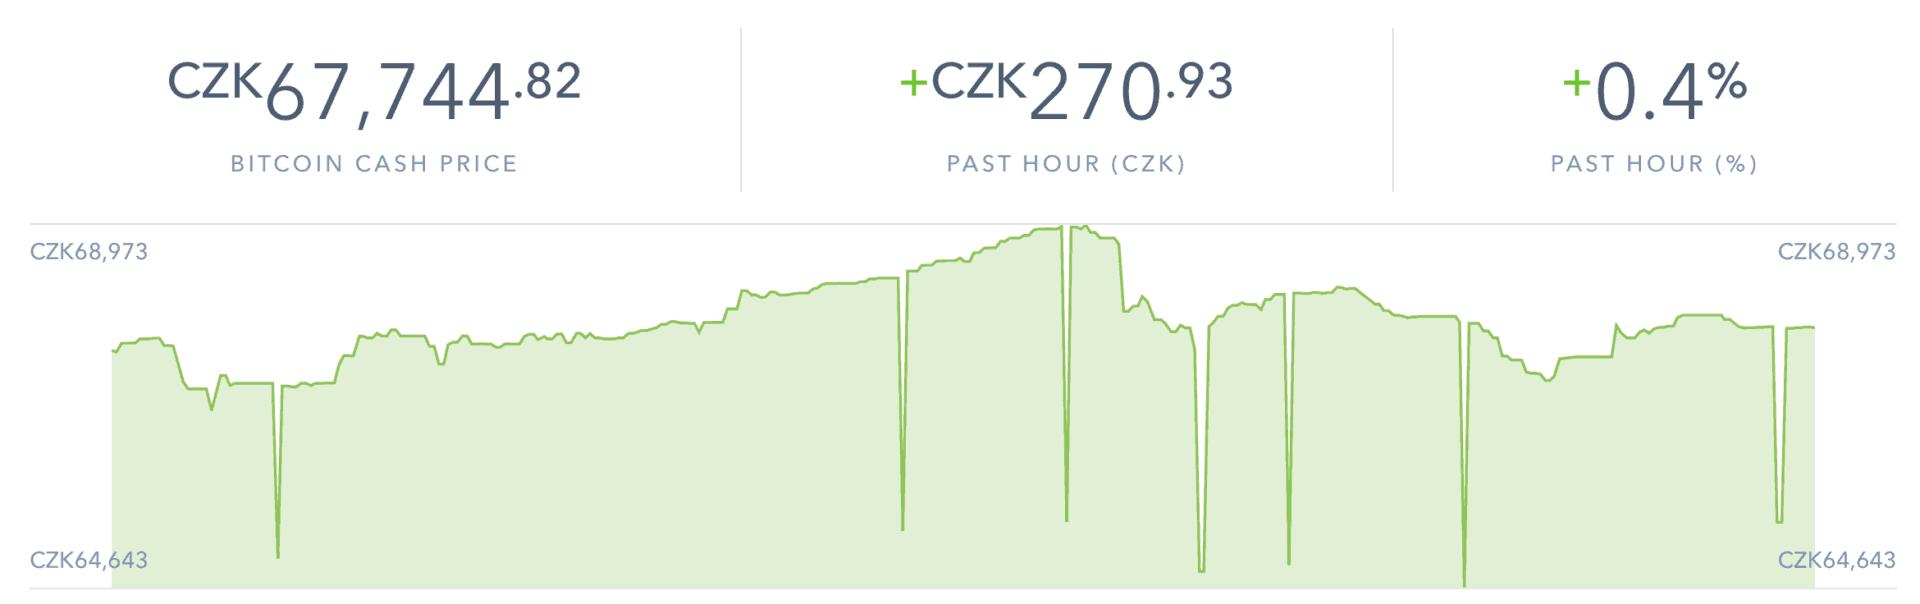 Kupuj, prodávej, odesílej a přijímej kryptoměnu Bitcoin Cash na Coinbase